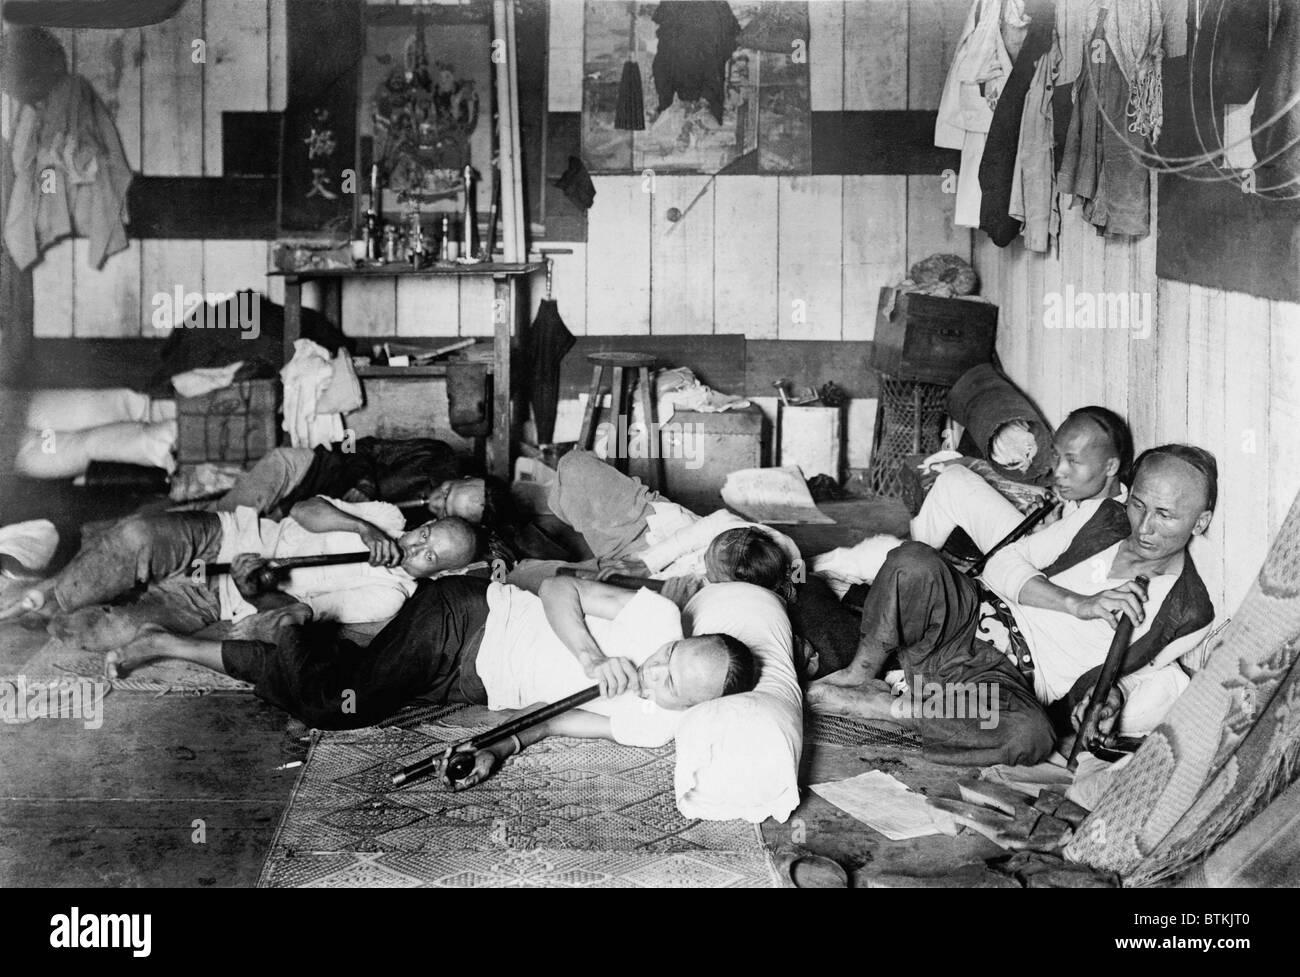 Ethnic Chinese smoking in an opium den in Manila, Philippine. 1924. - Stock Image